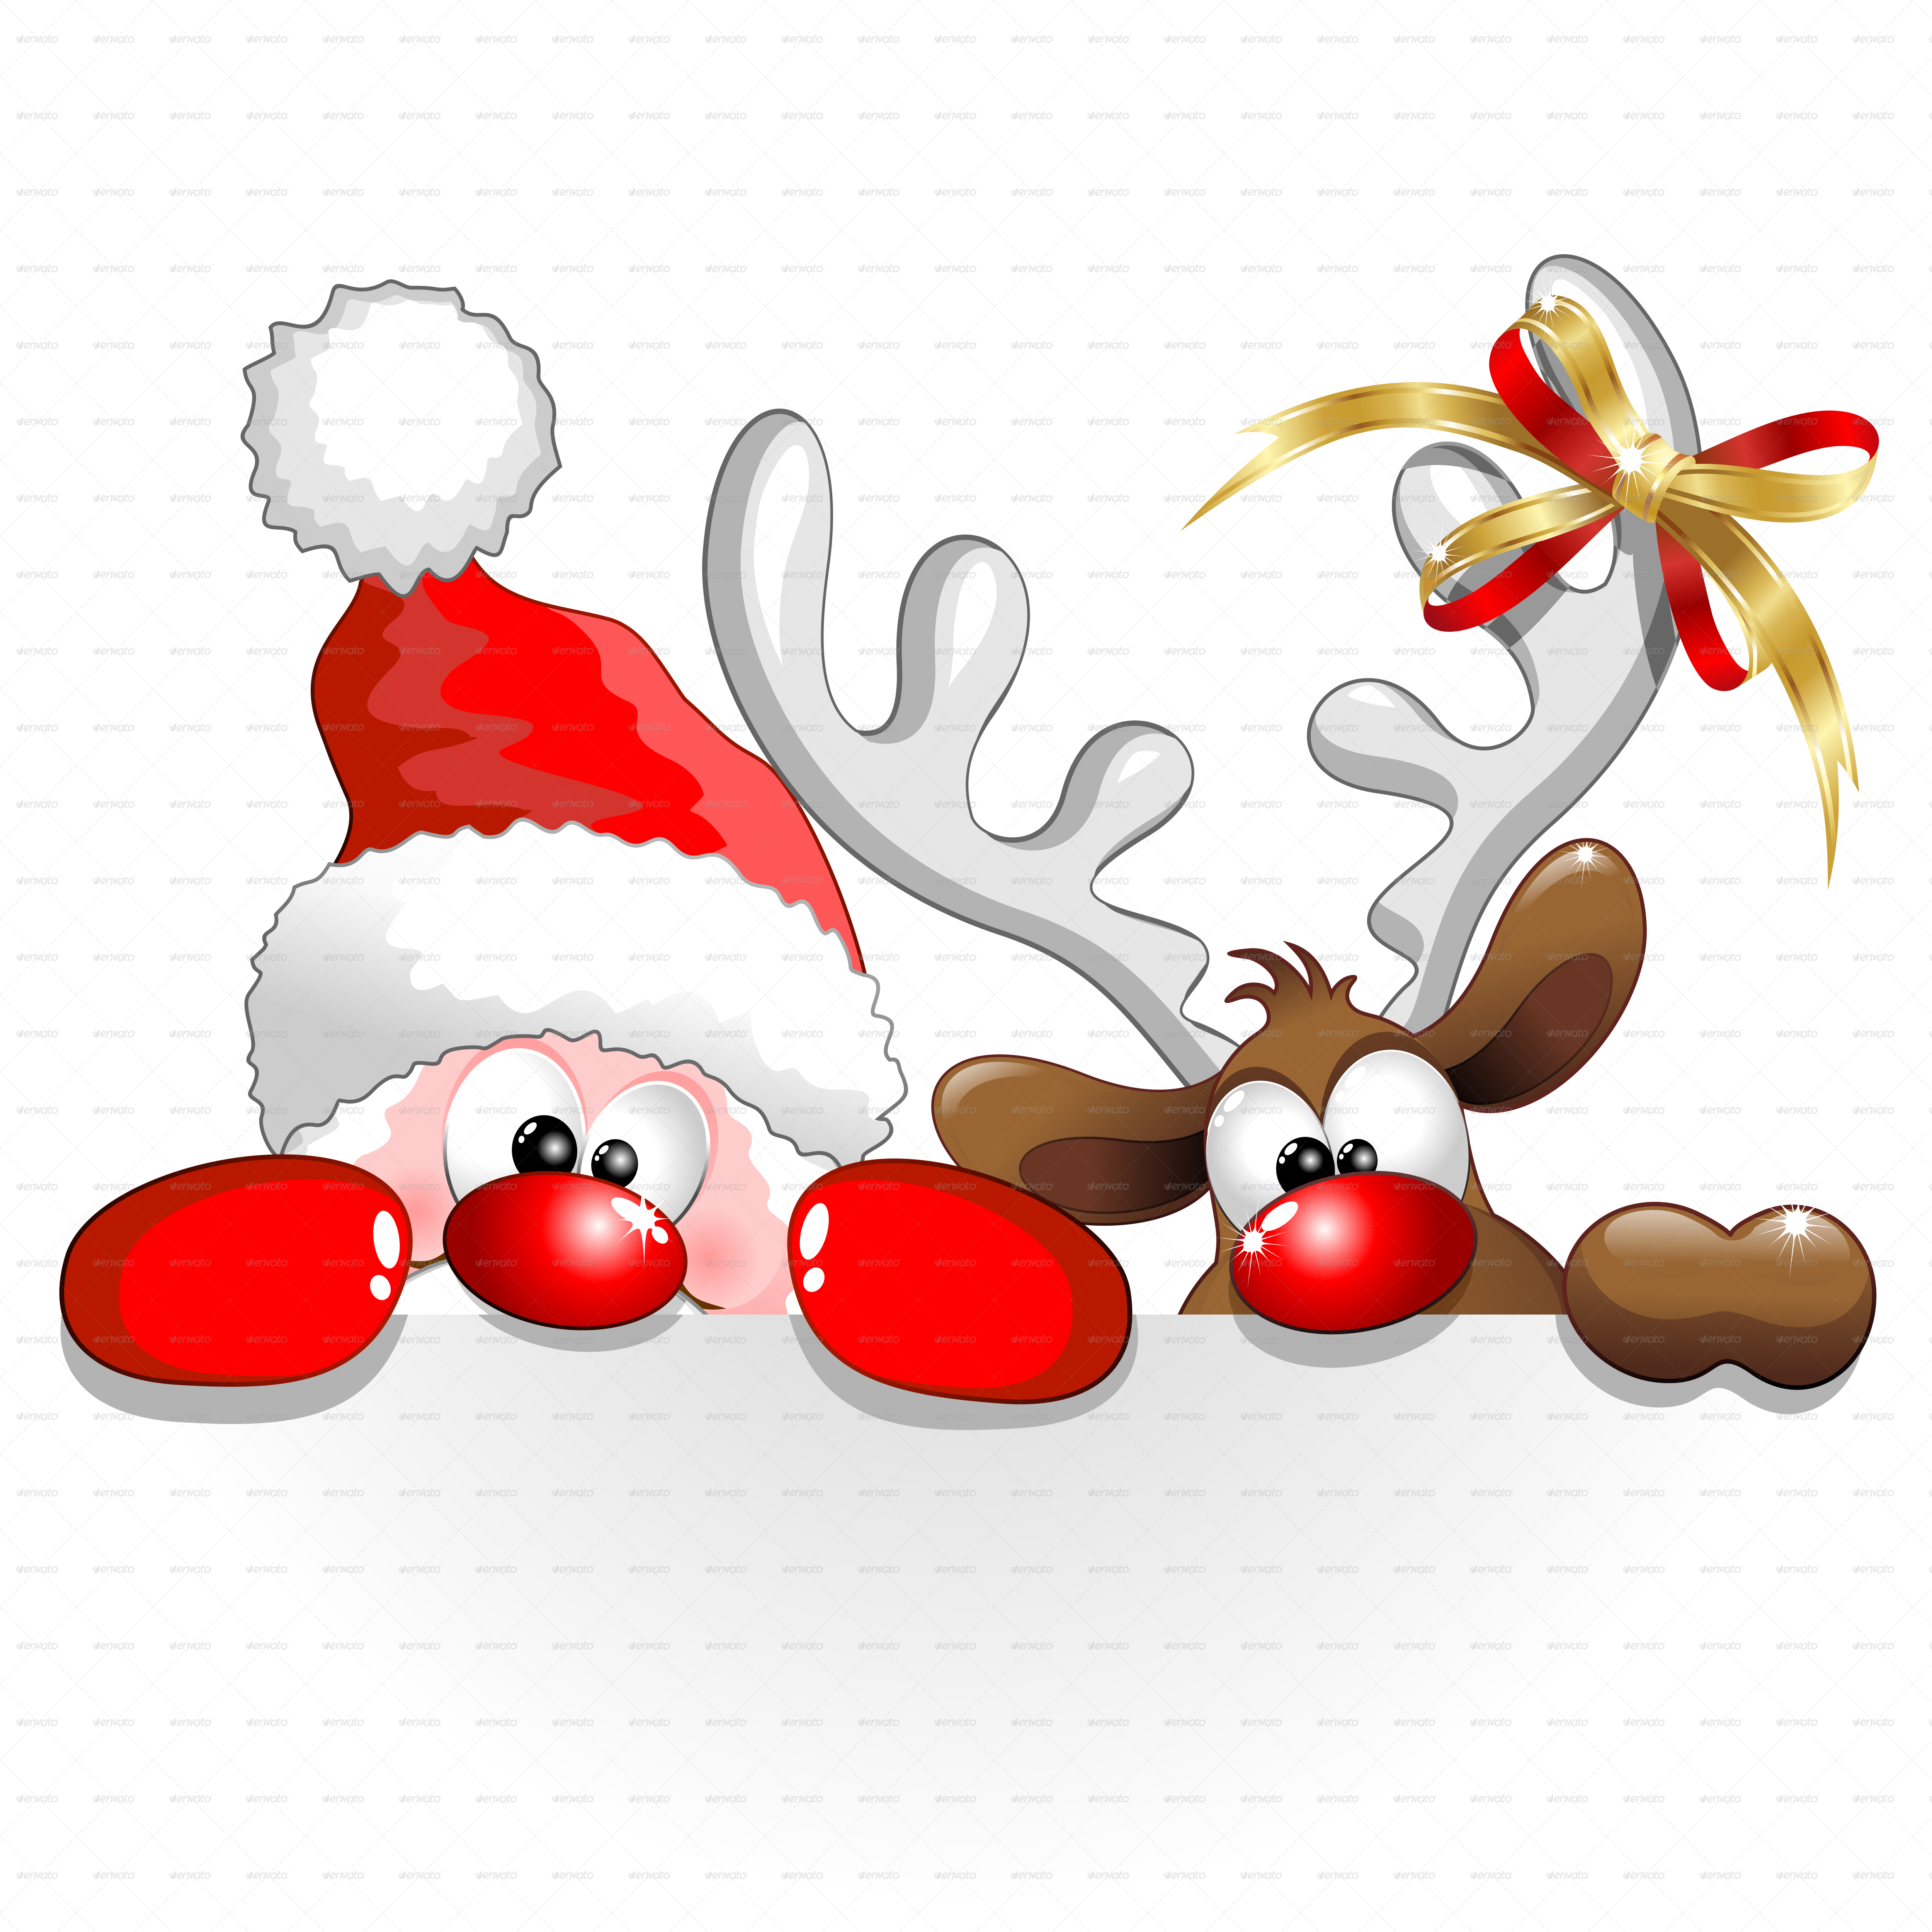 Uncategorized Santa And Reindeer christmas santa and reindeer cartoon window decoration cartoon